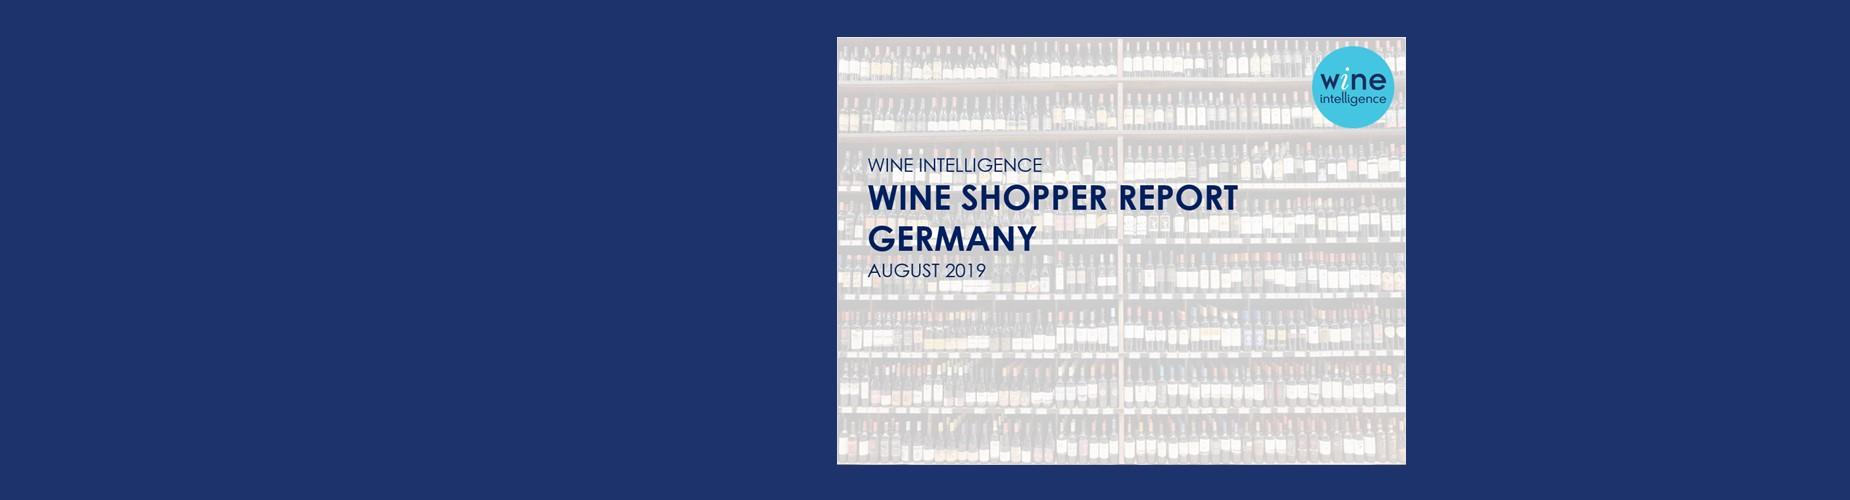 Wine Shopper Report Germany 2019